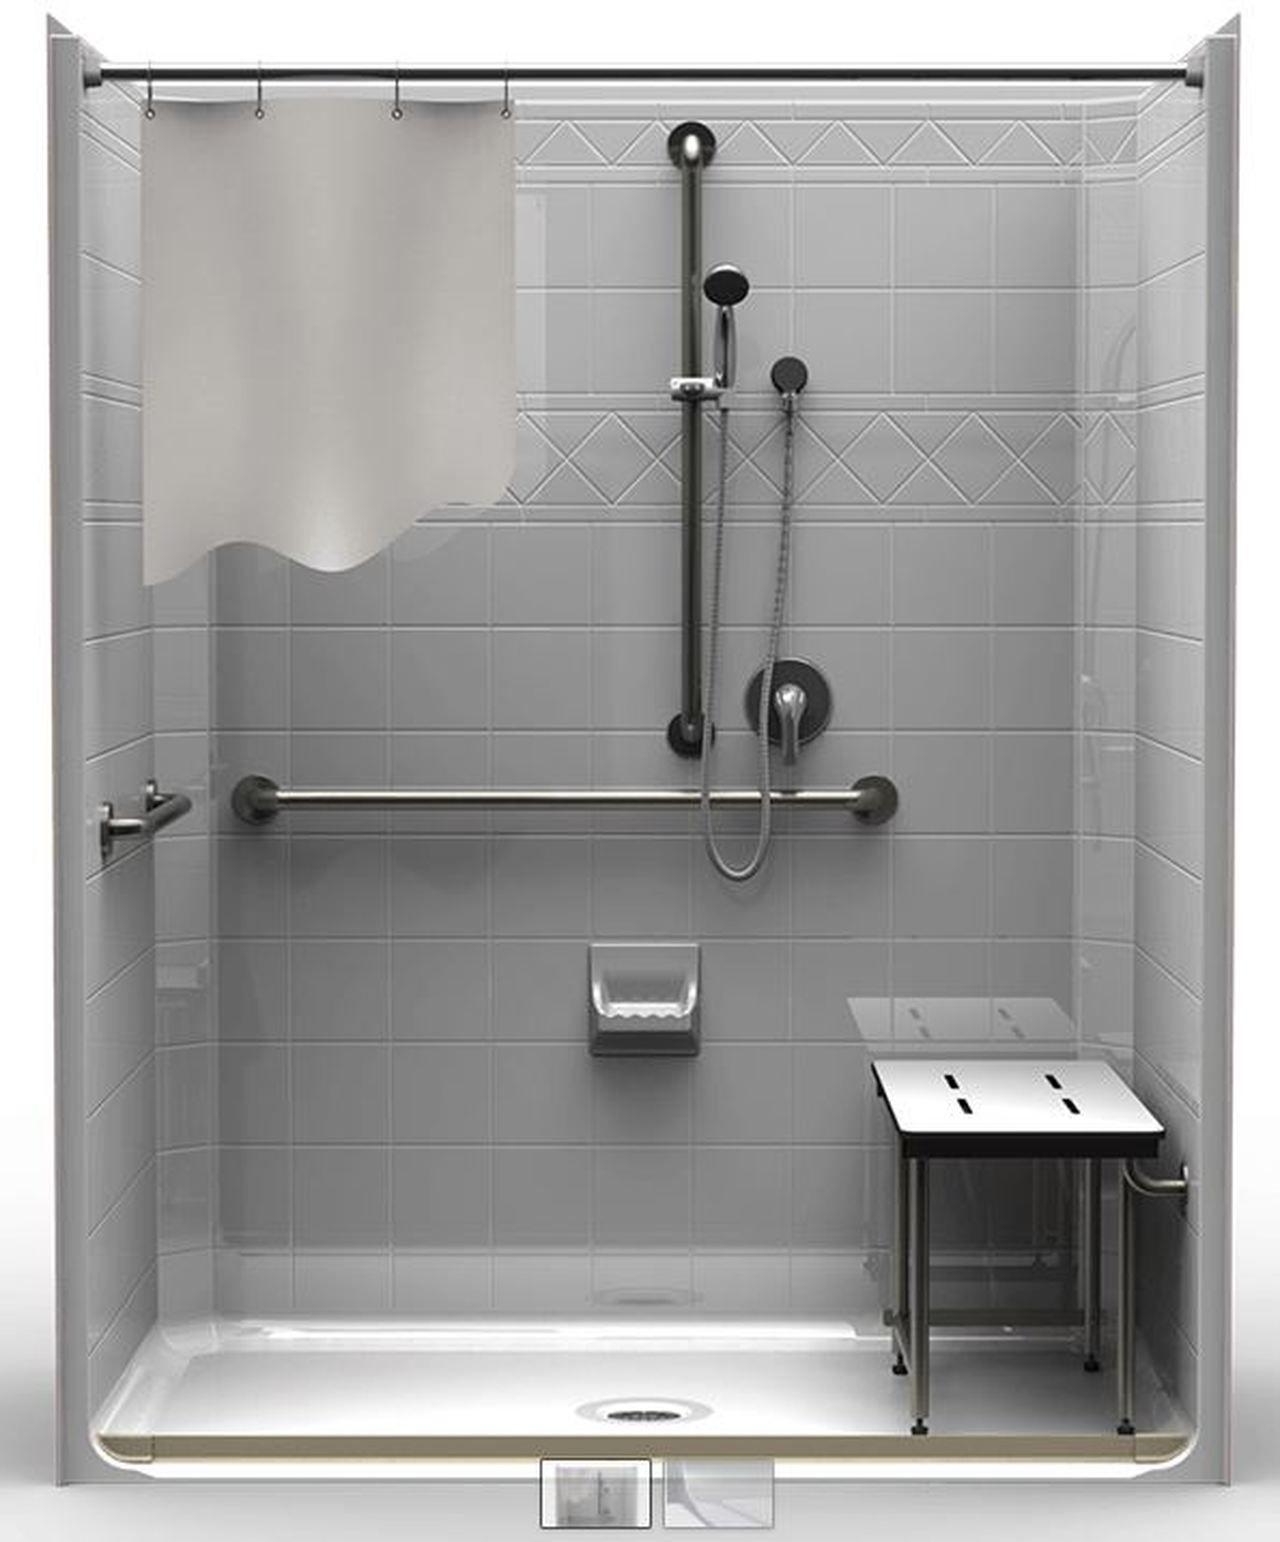 5 Piece ADA RollIn Shower With Center Drain Fiberglass